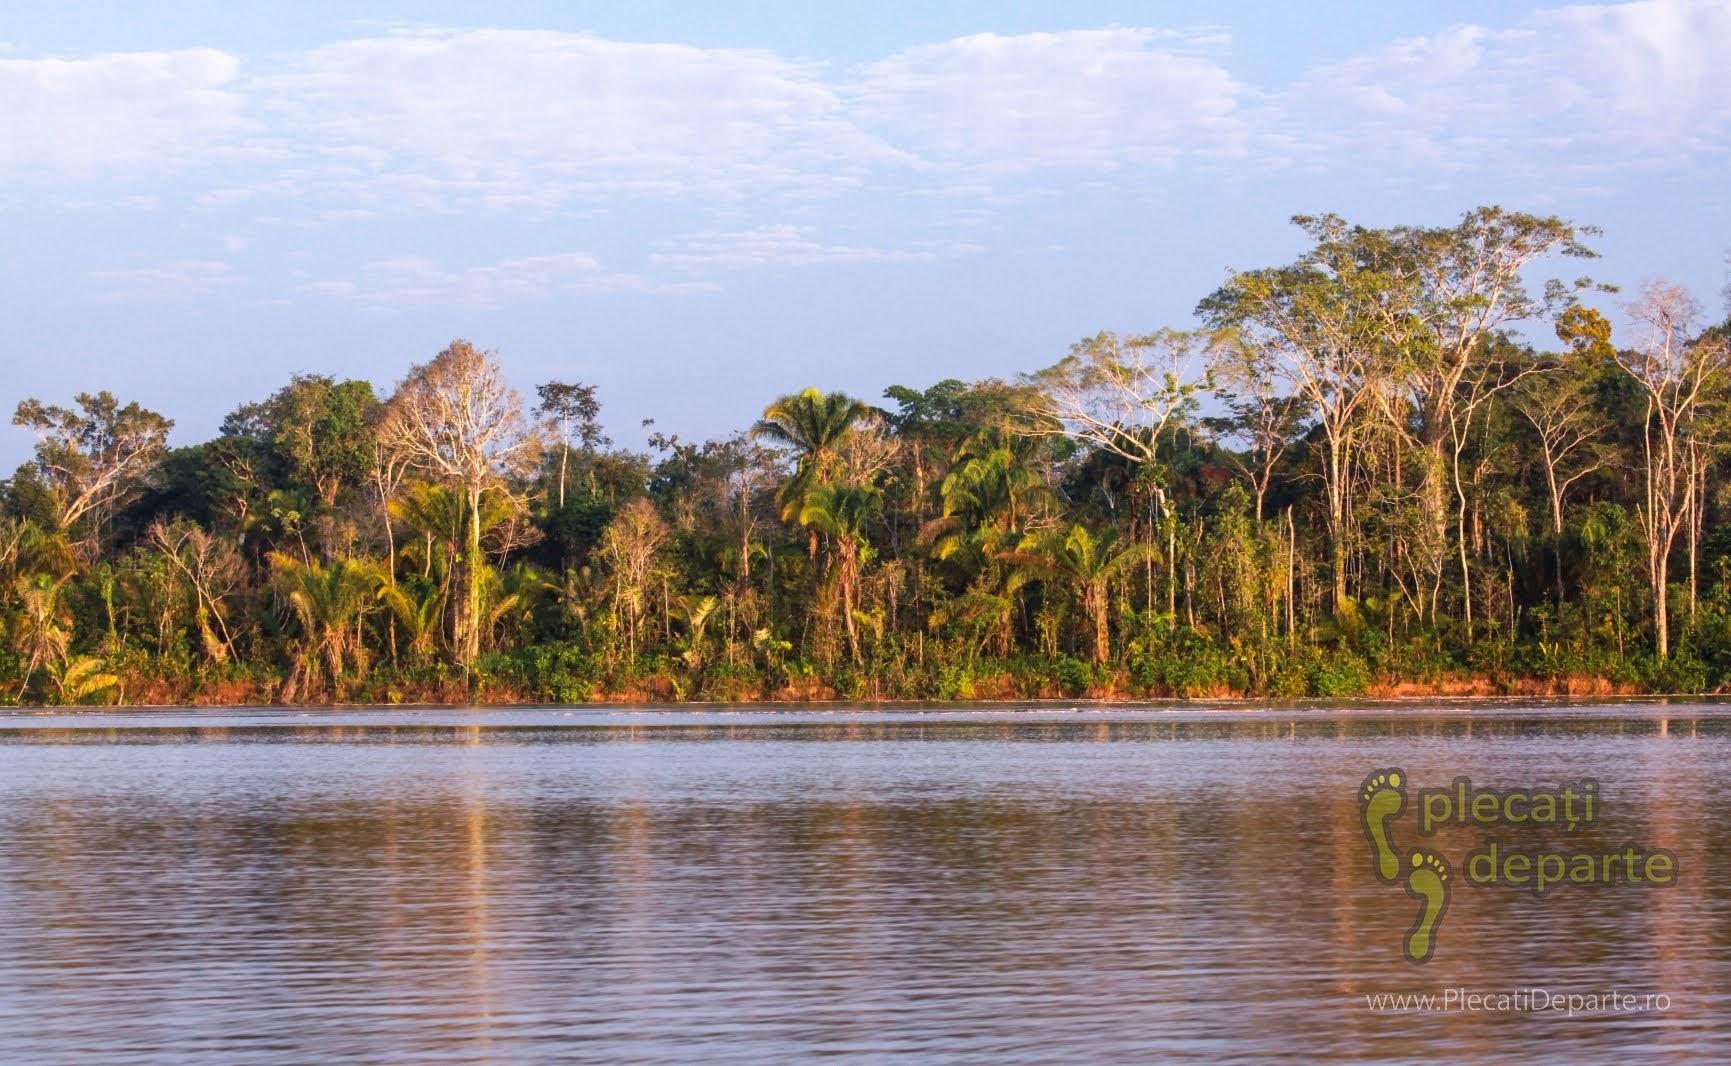 Raul Huallaga, afluent al fluviului Amazonian, in jungla amazoniana, in Peru